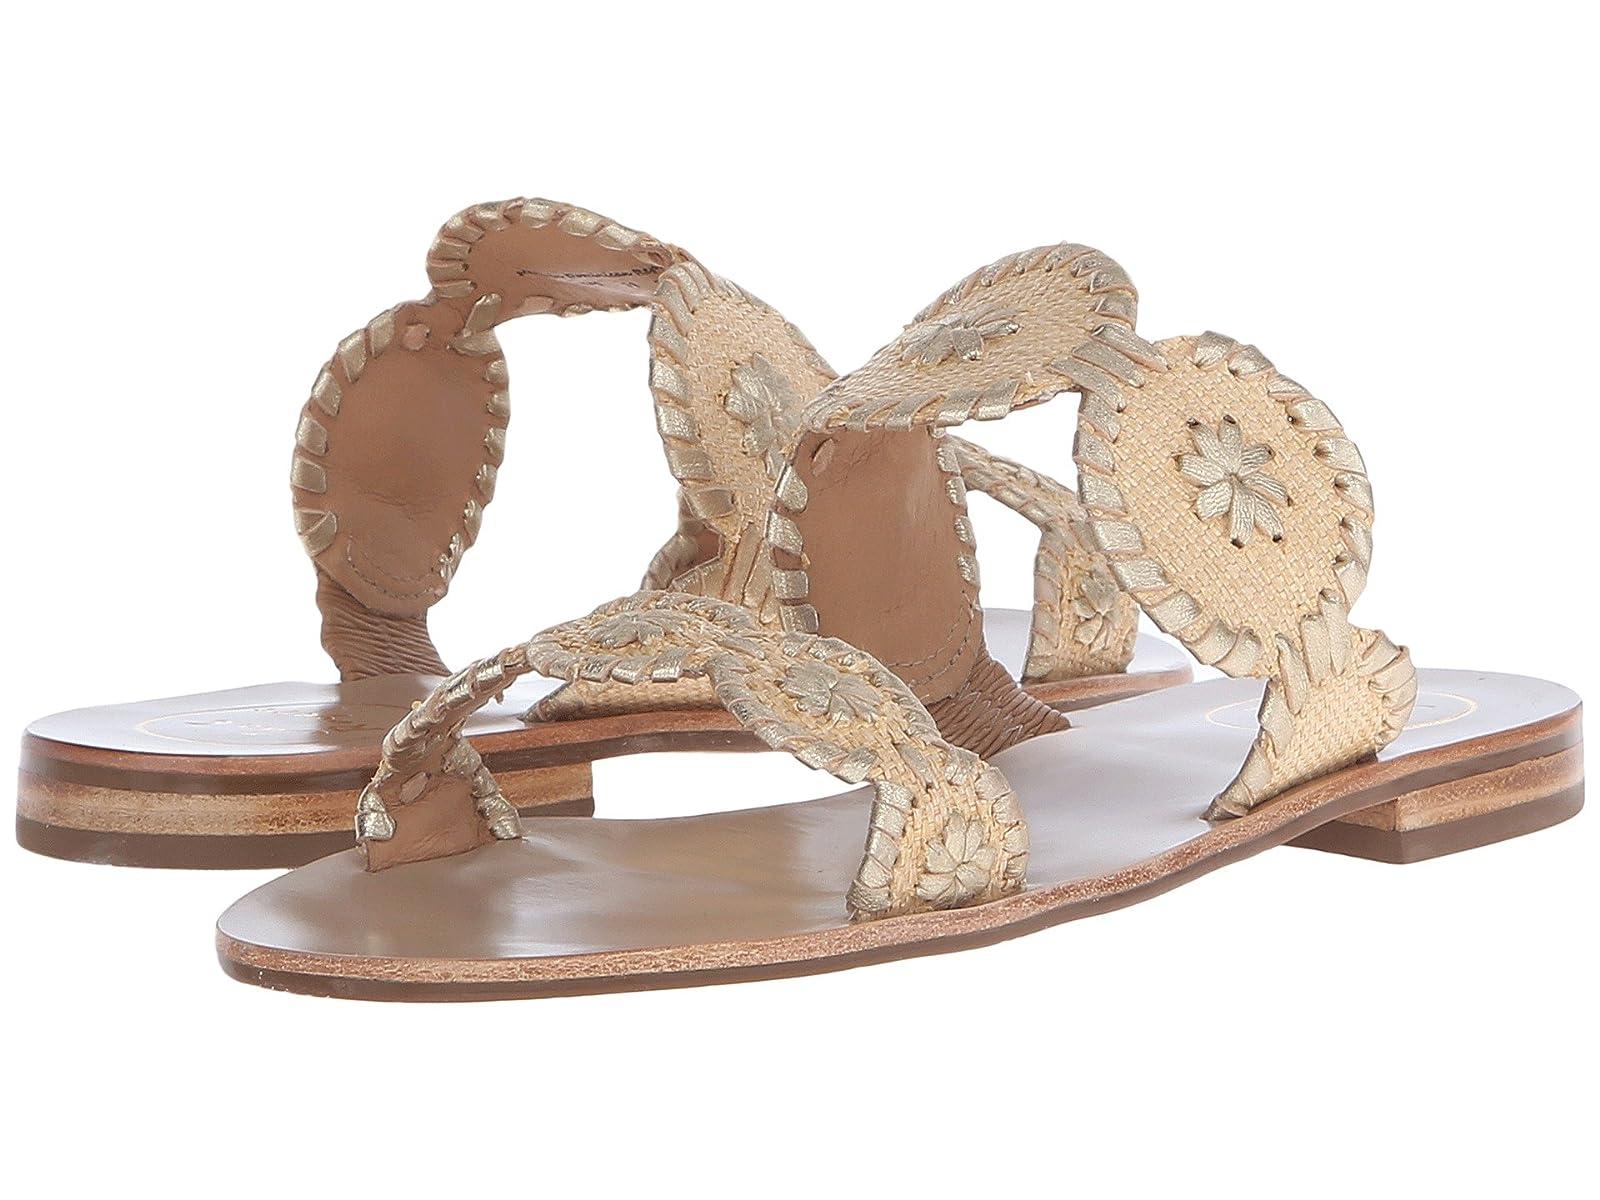 Jack Rogers Lauren RaffiaCheap and distinctive eye-catching shoes